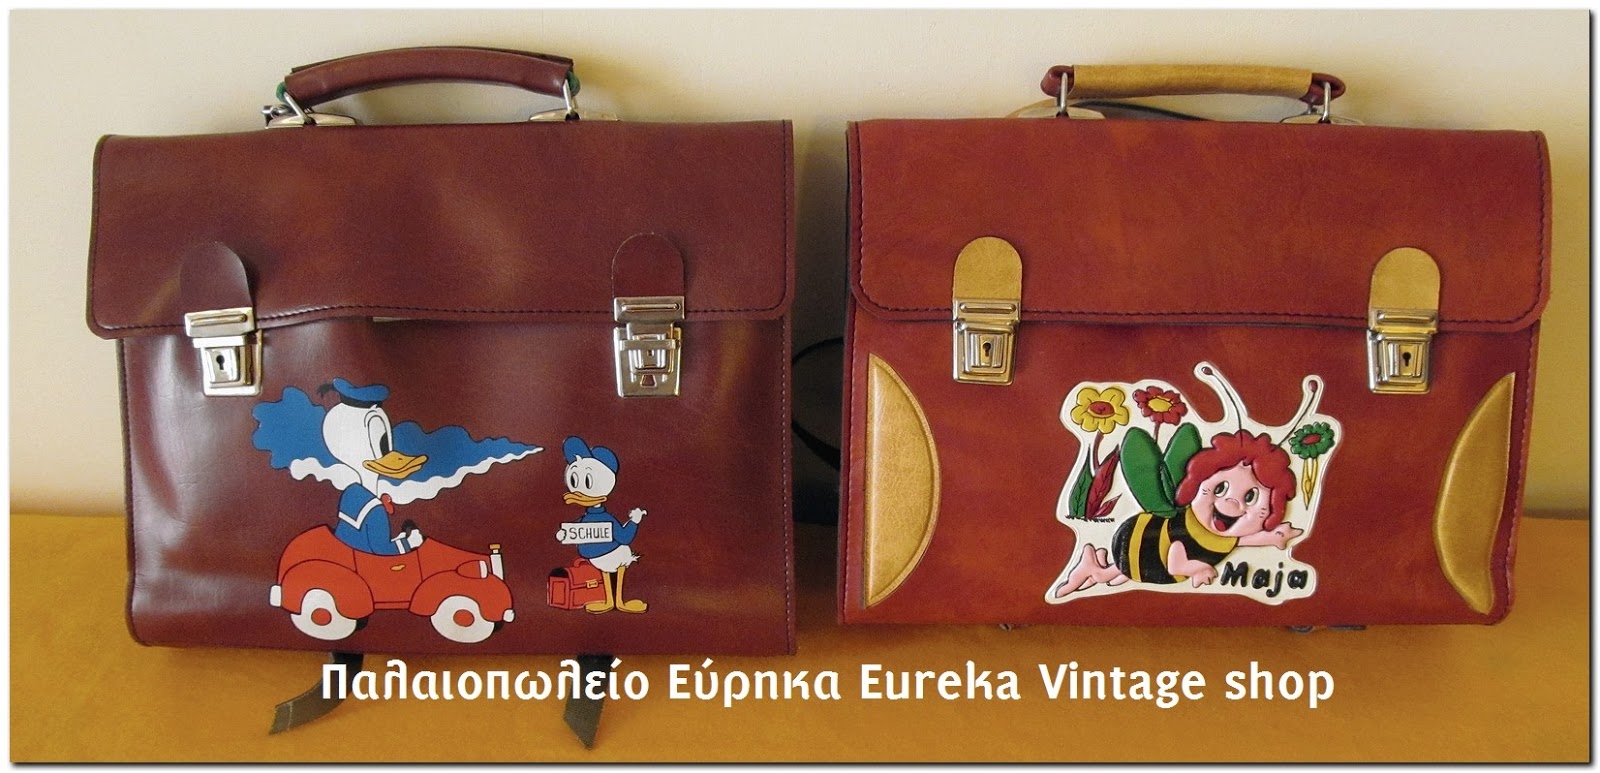 d0de8c4a3b Παλιά σχολικά είδη. - Παλαιοπωλείο Εύρηκα Eureka Vintage shop